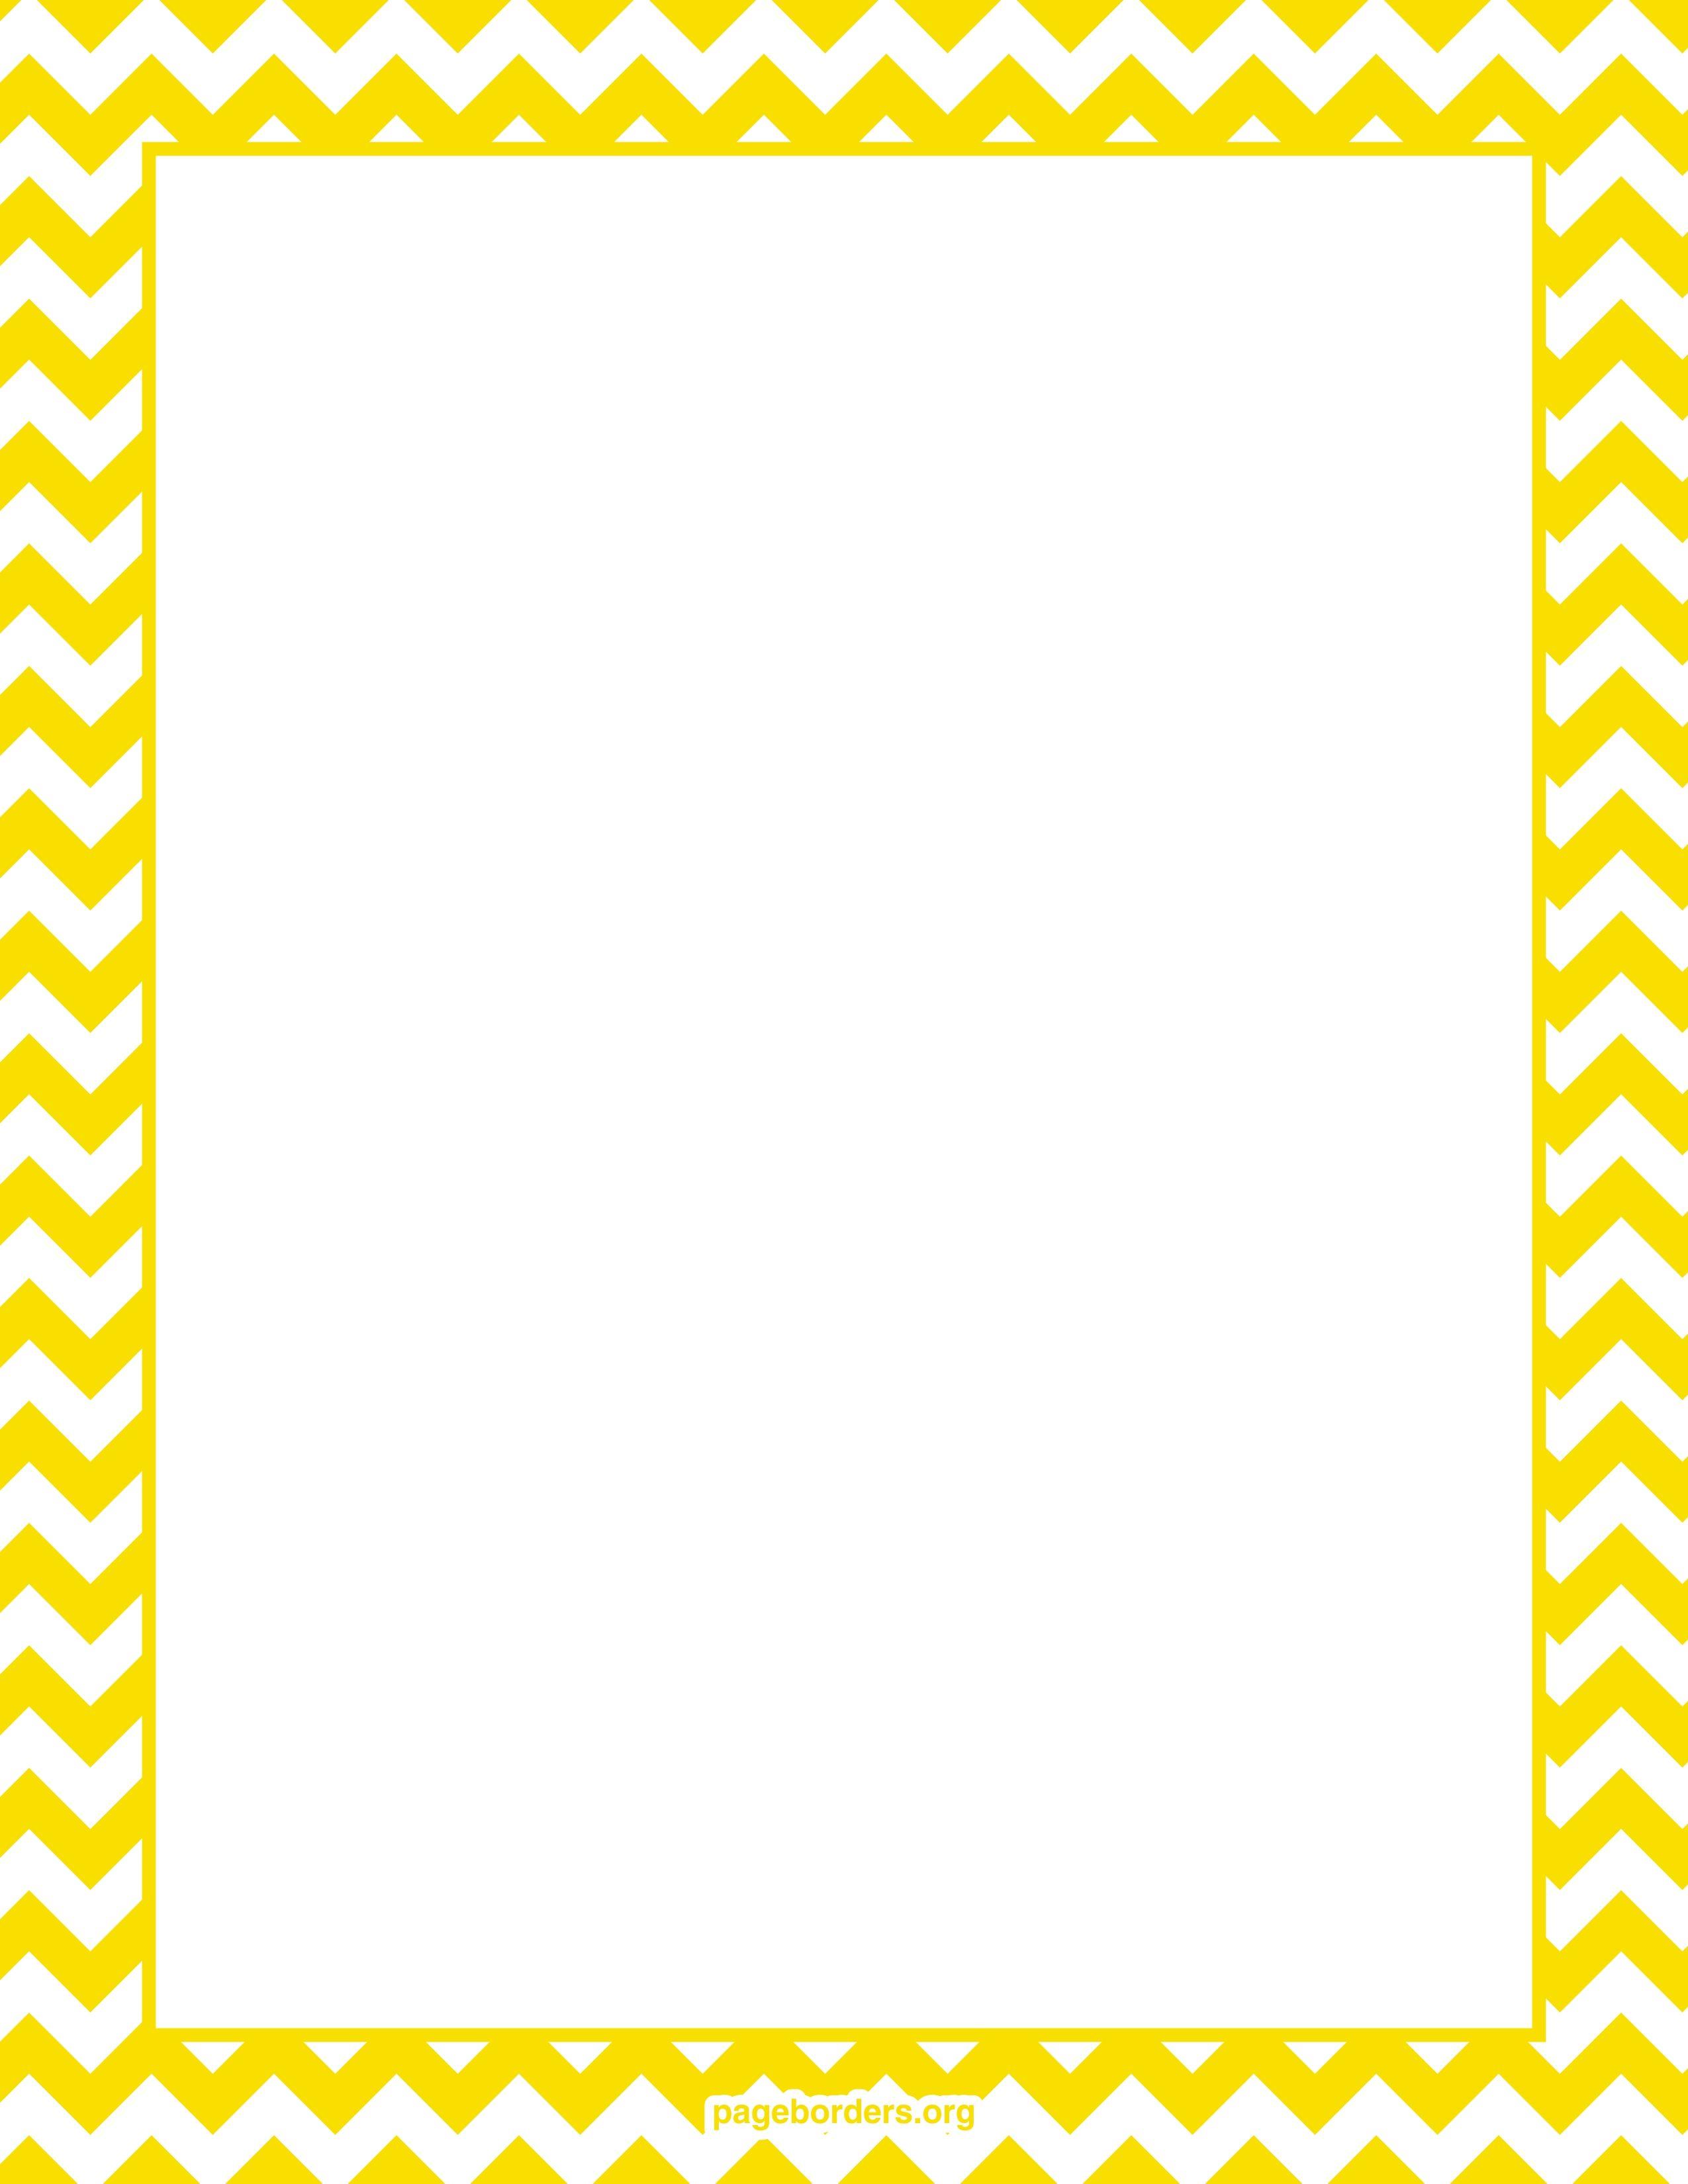 yellowchevronborderwatermarked.jpg (2550×3300) Bordes